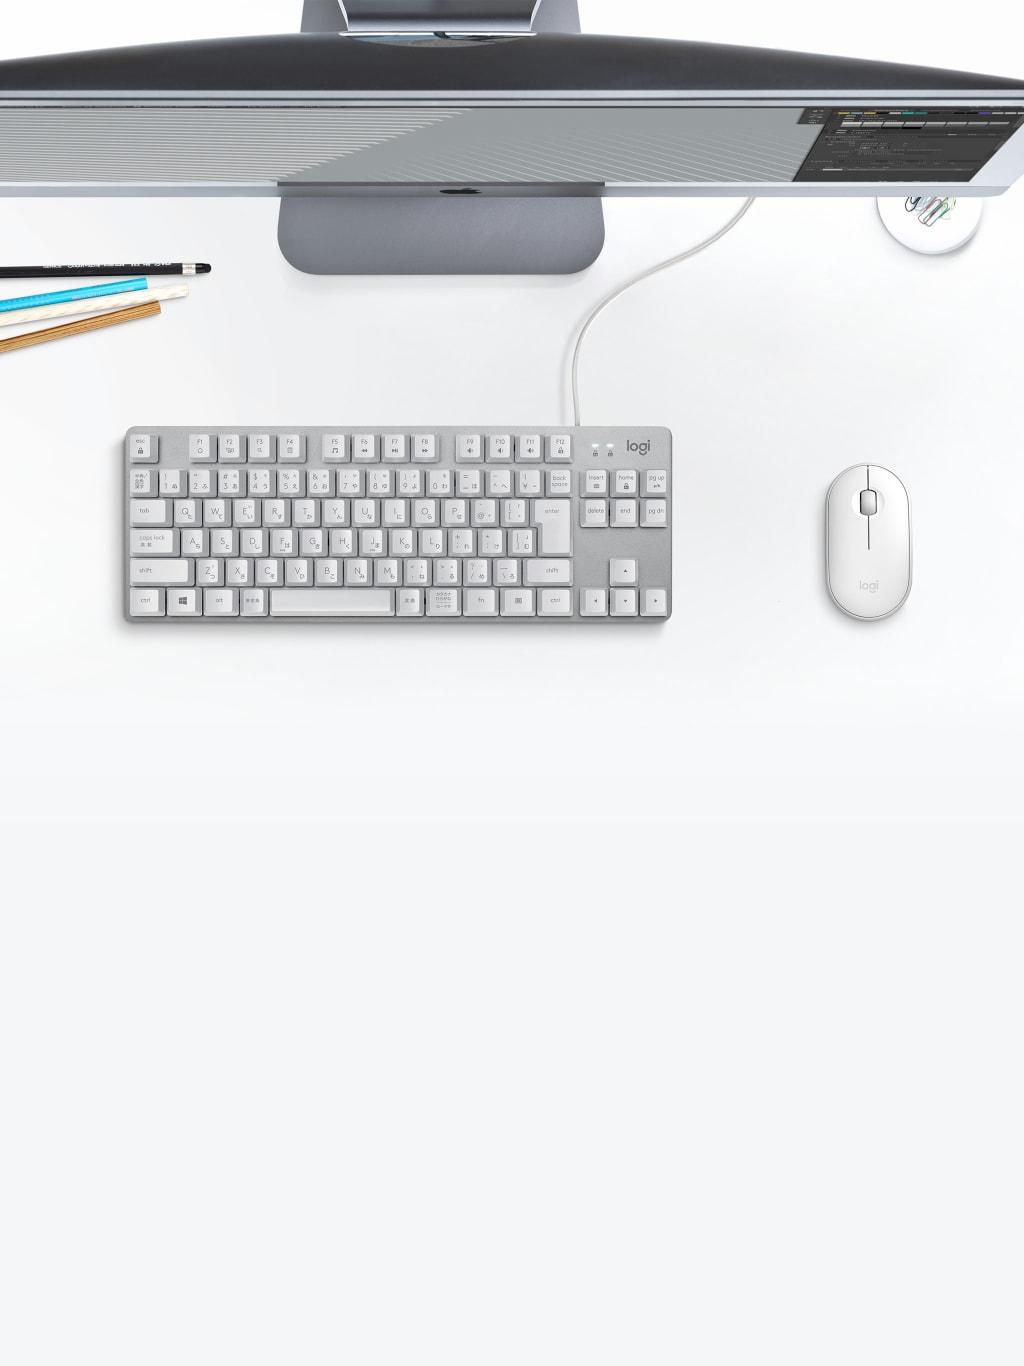 k835-feature-03-tablet-b-jp